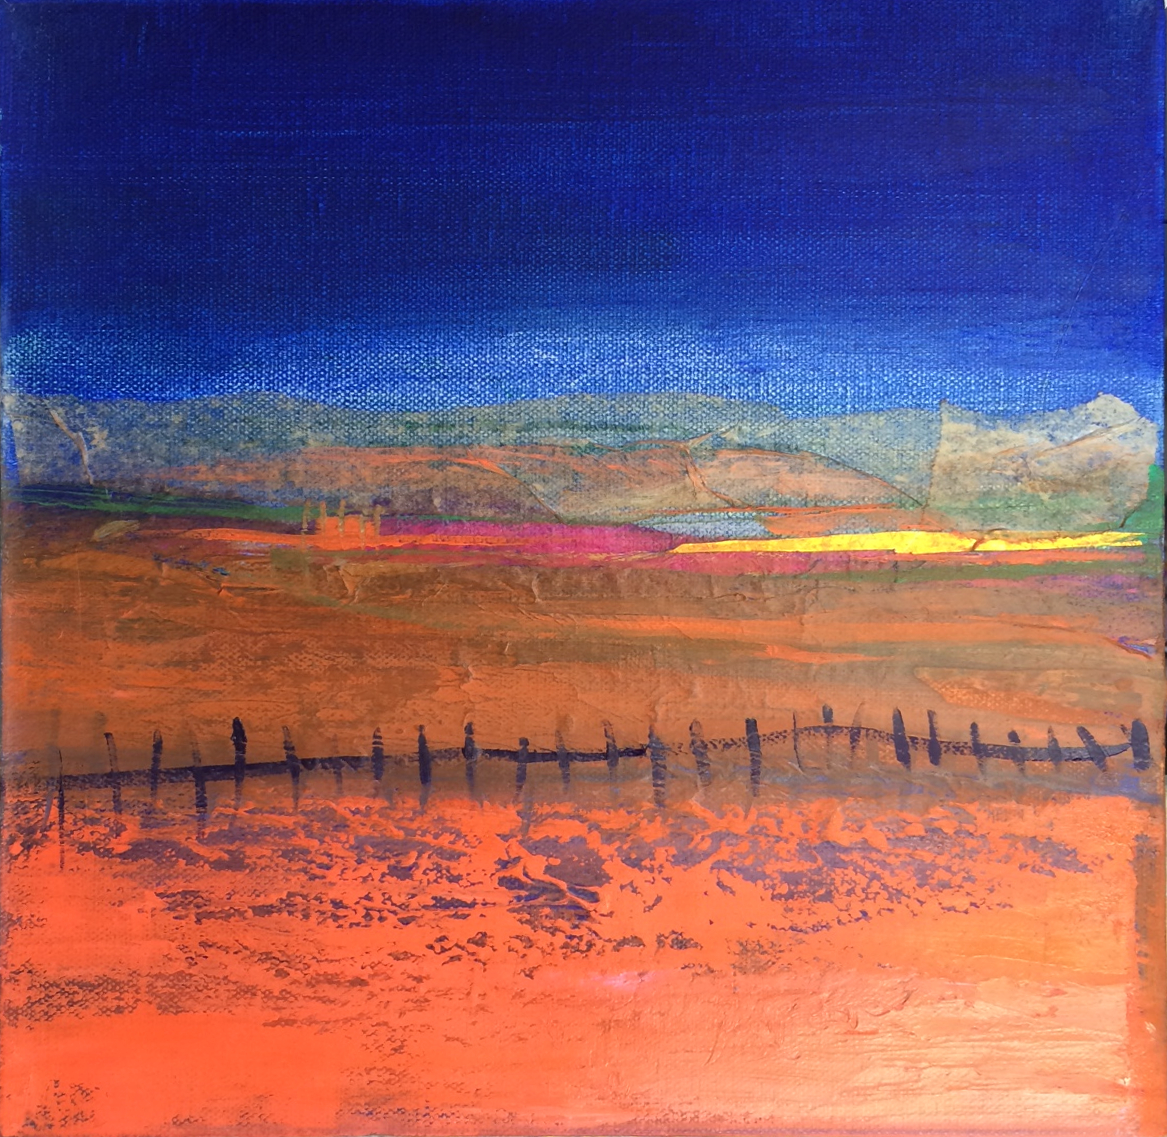 Blue and Orange Landscape with Fence